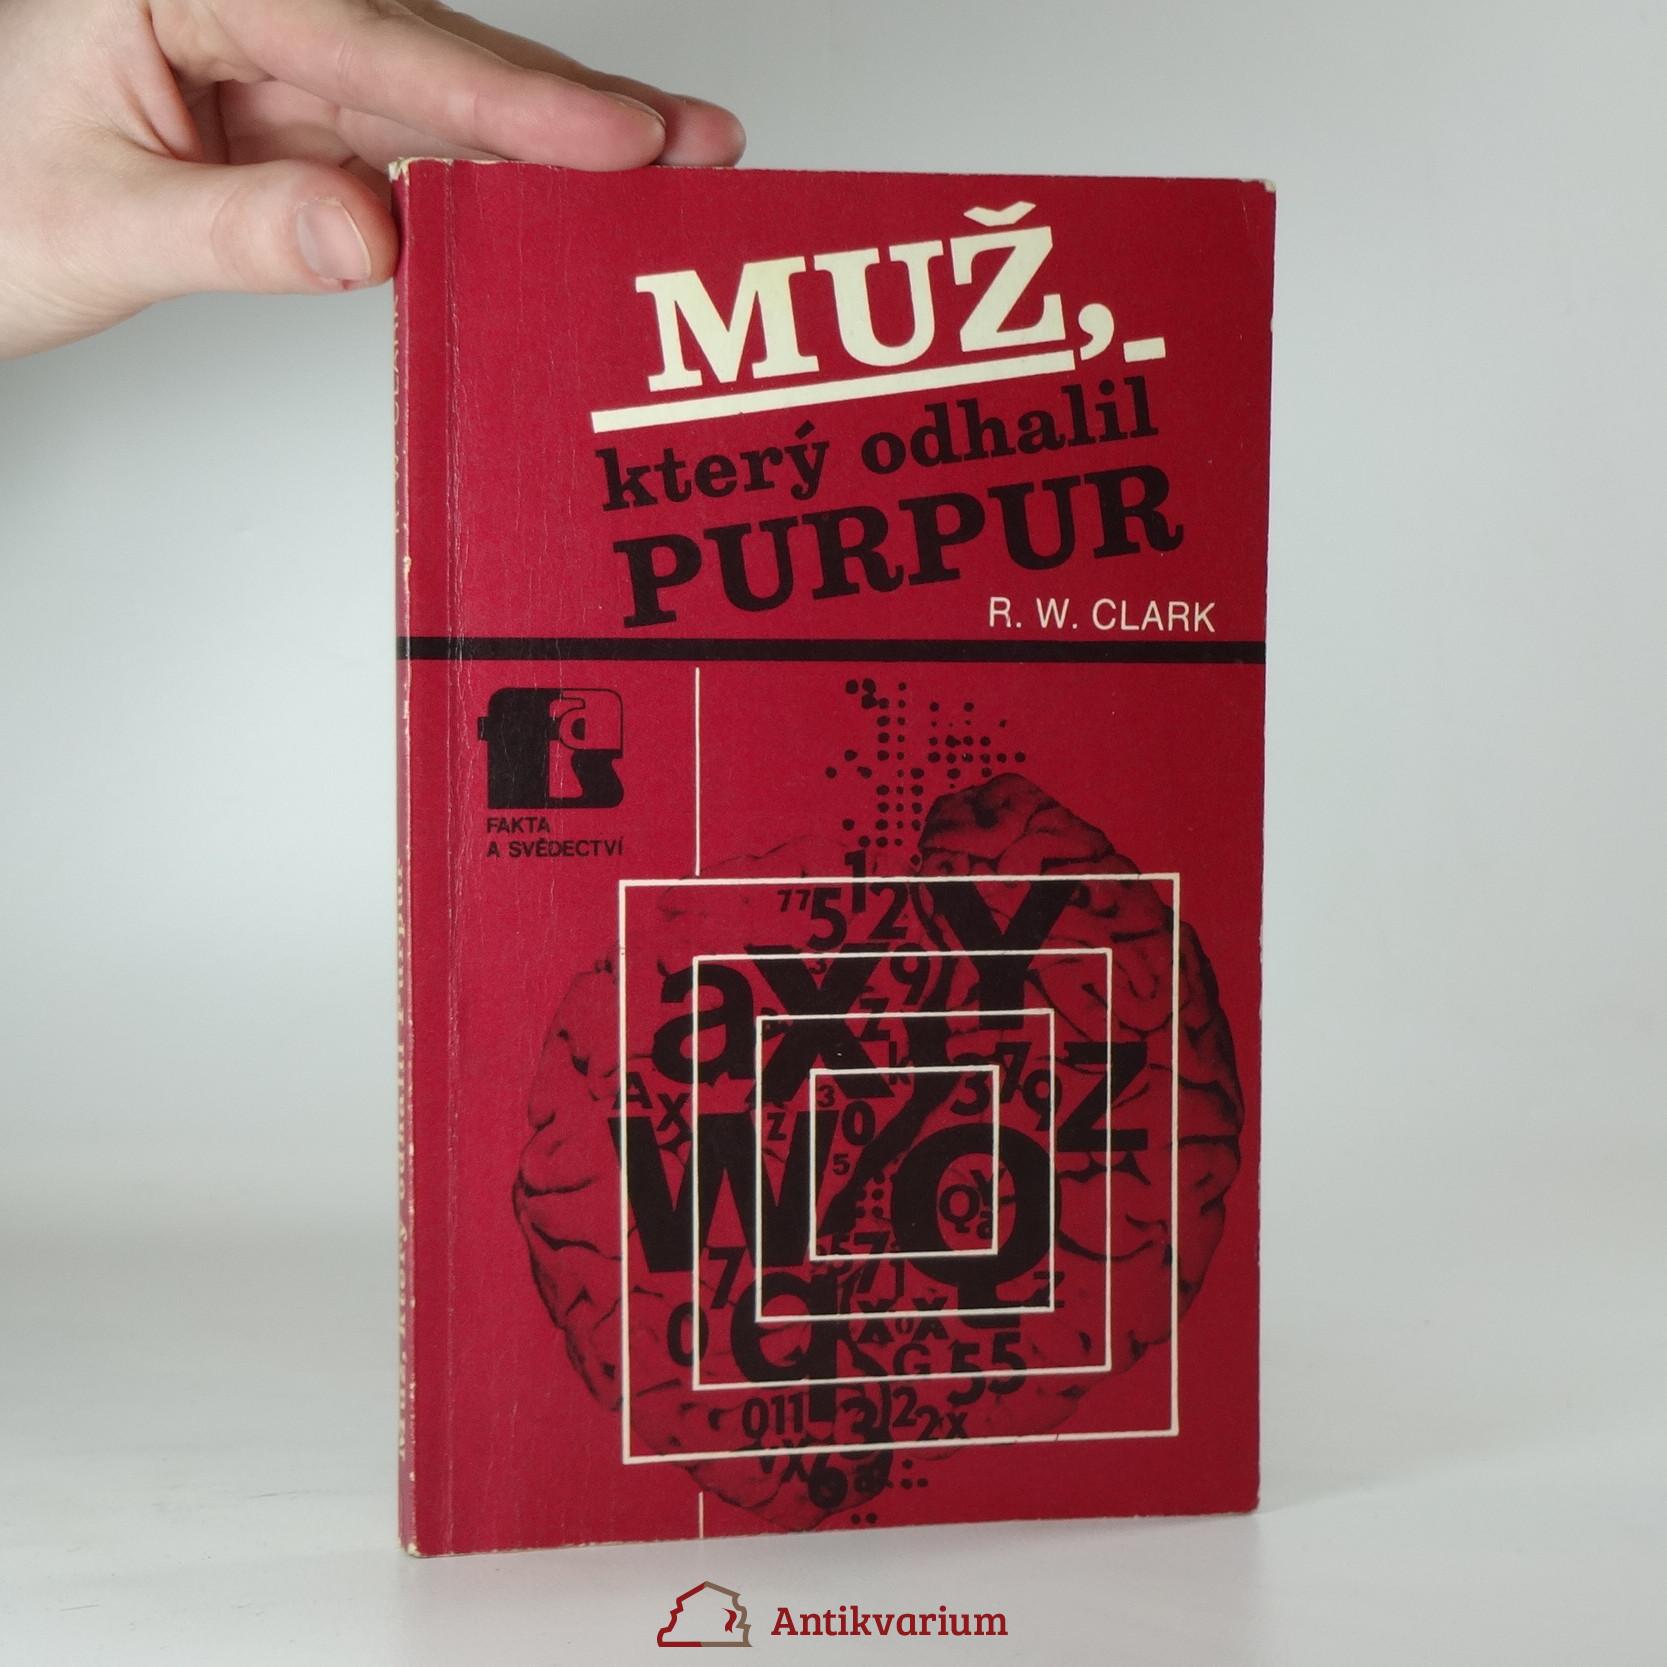 antikvární kniha Muž, který odhalil Purpur, 1983